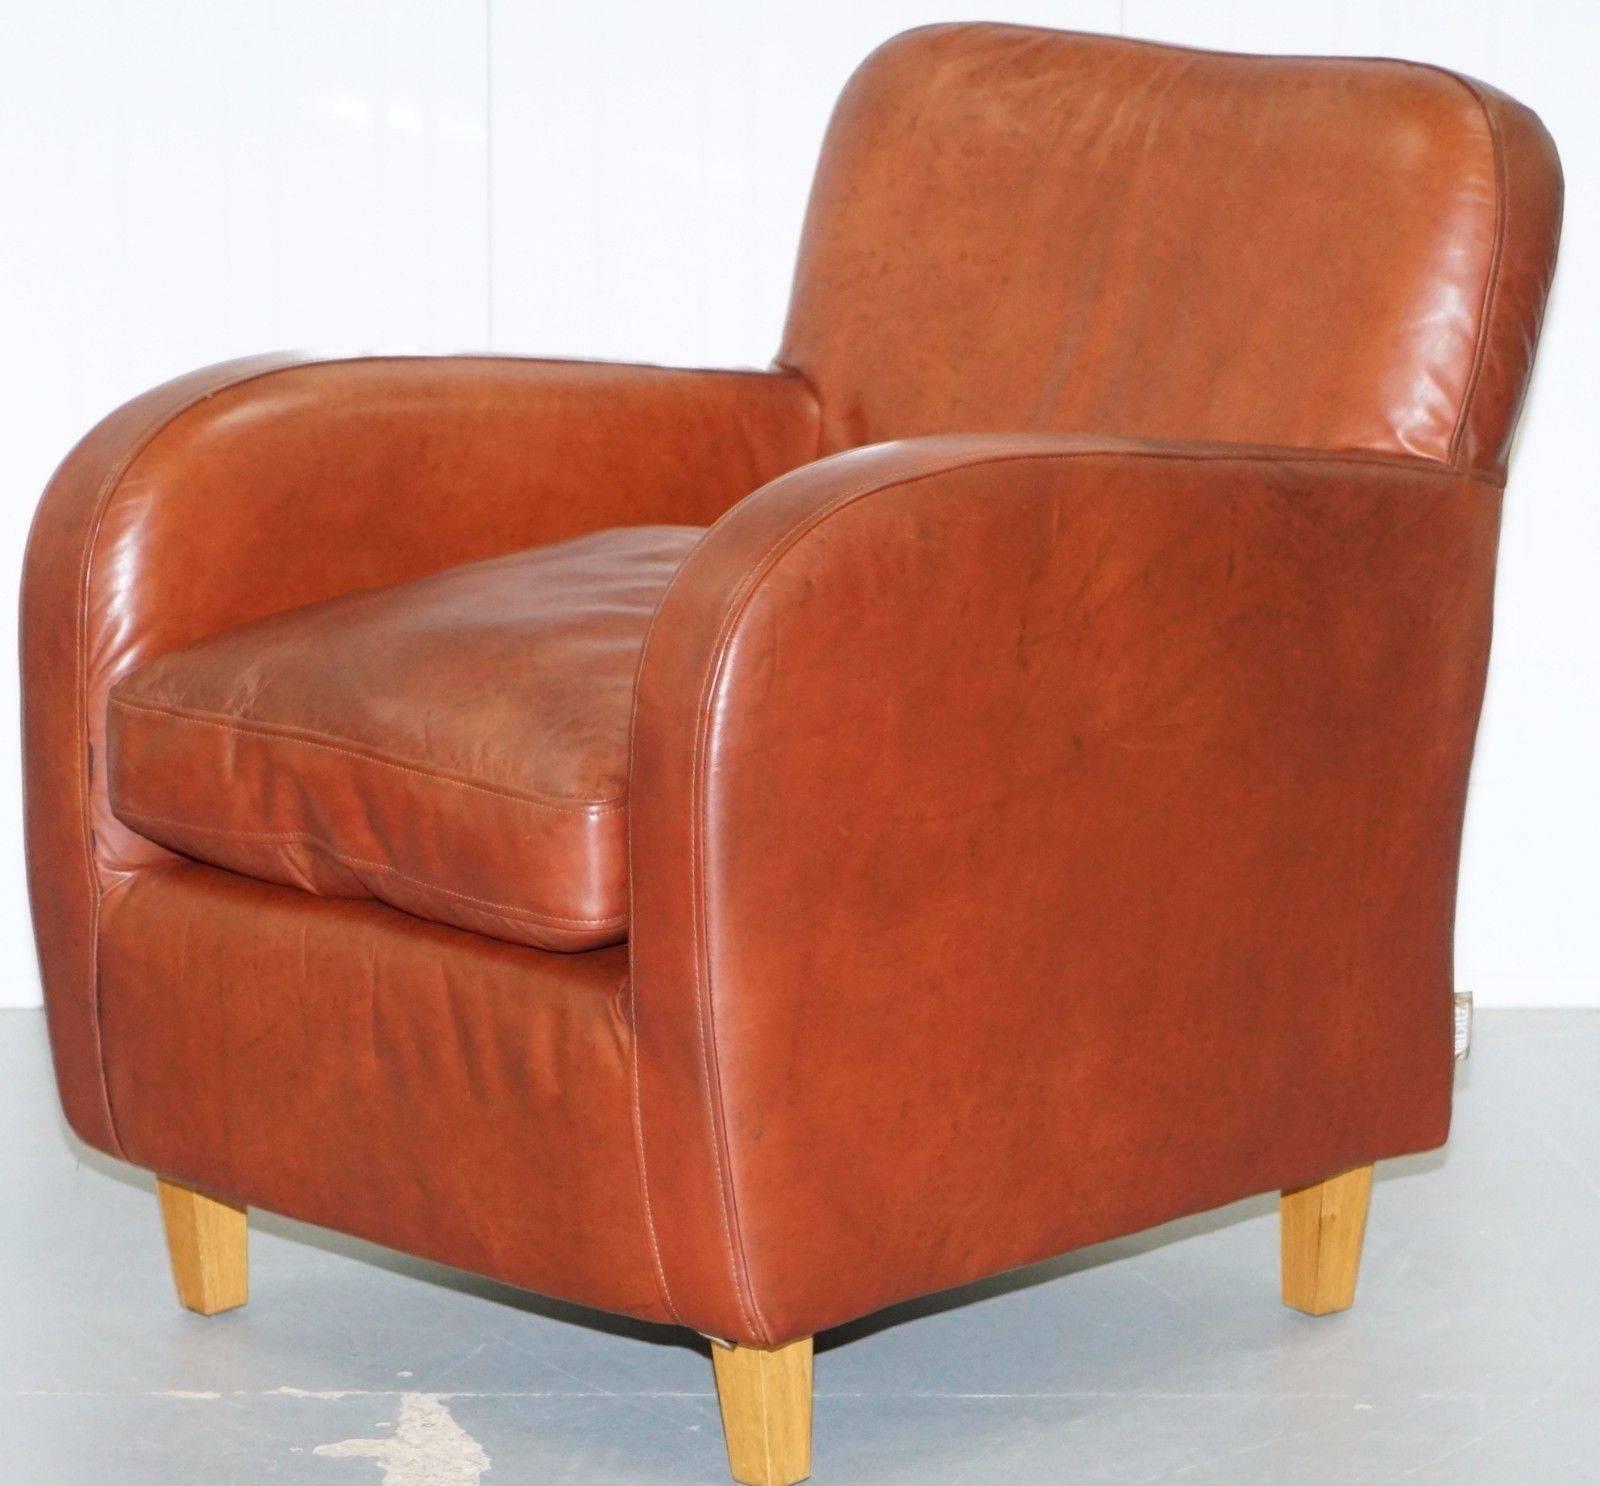 Modern Habitat Havana Aged Brown Leather Club Armchair Feather Filled  Cushion For Sale